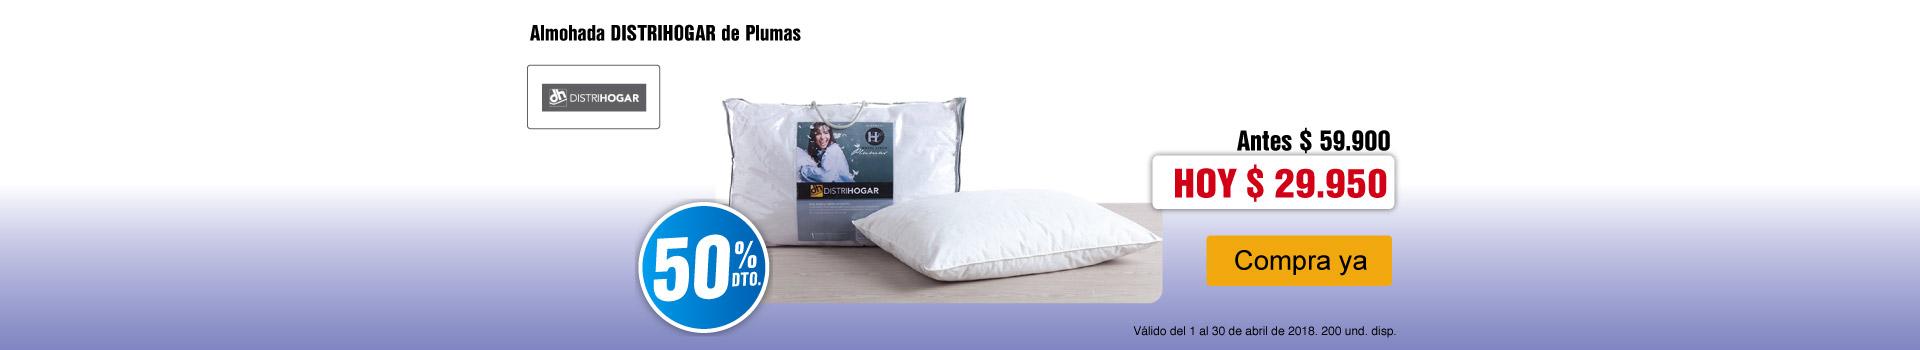 CAT-AK-3-habitacion-almohada-plumas-distrihogar-Abril7-30